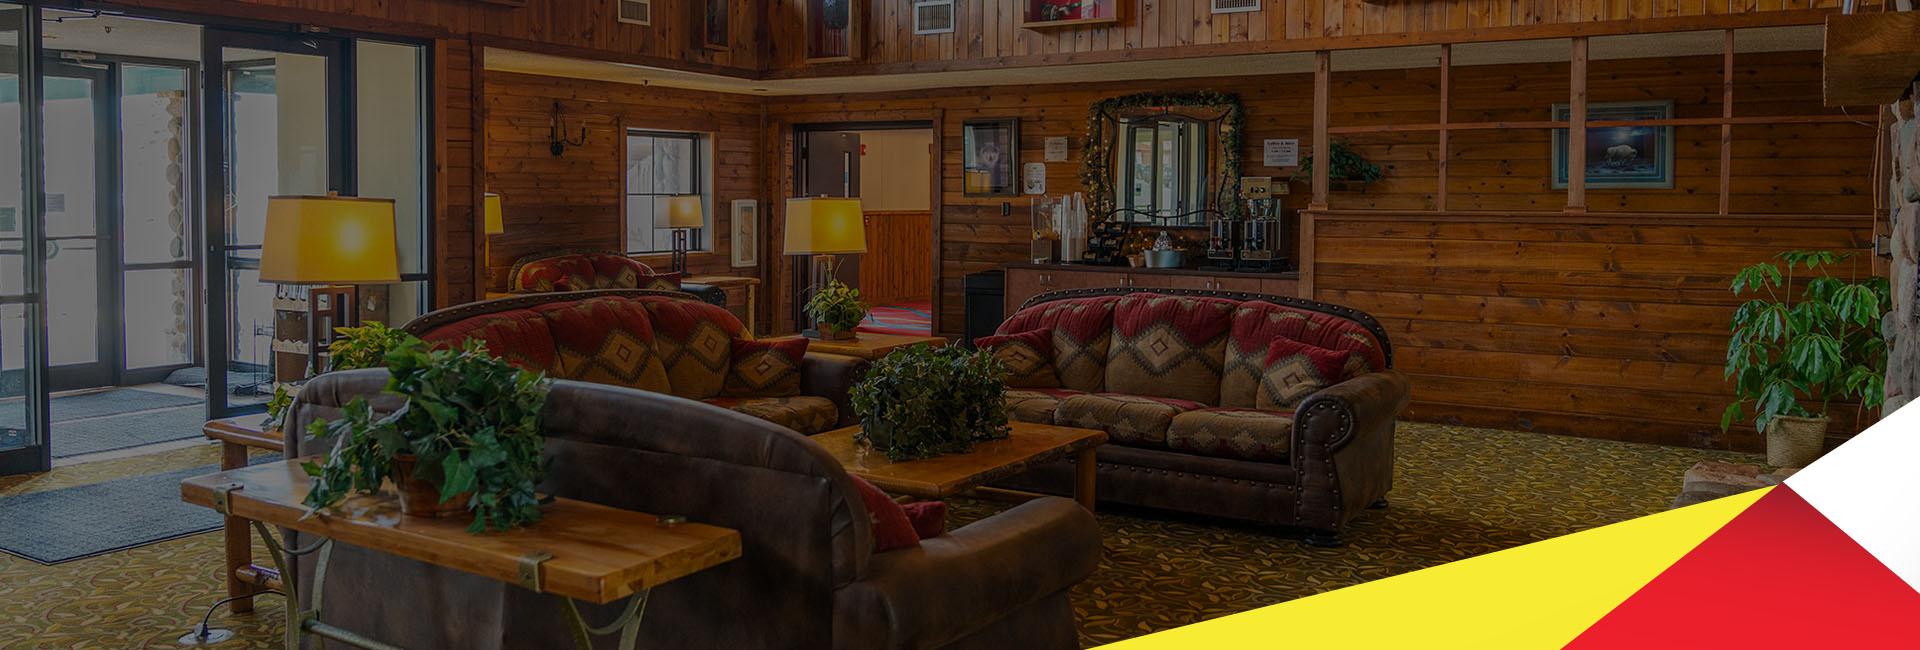 Authentic Northwoods Lodge